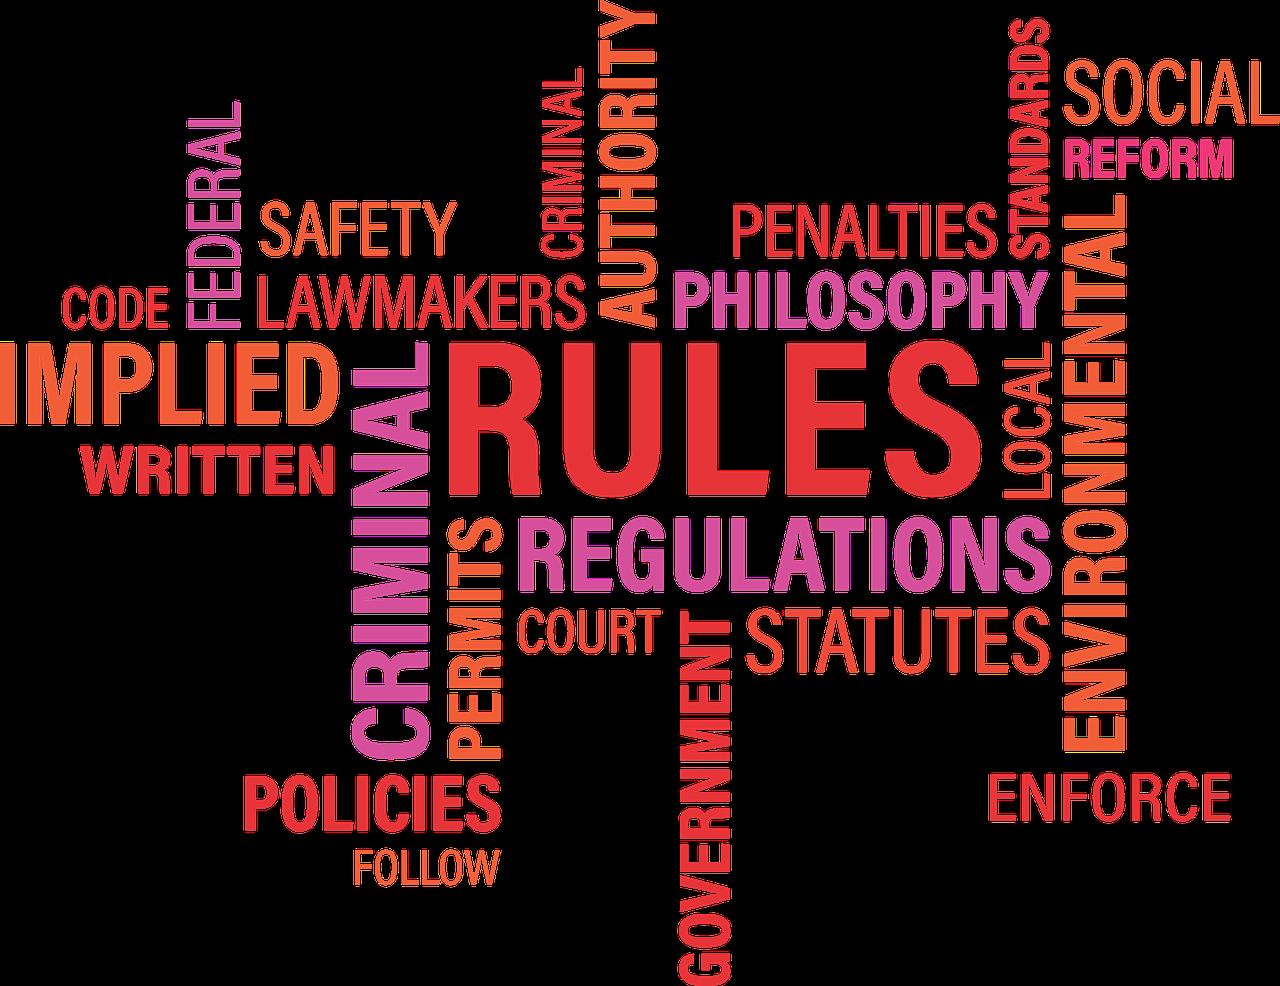 rules-1339917_1280